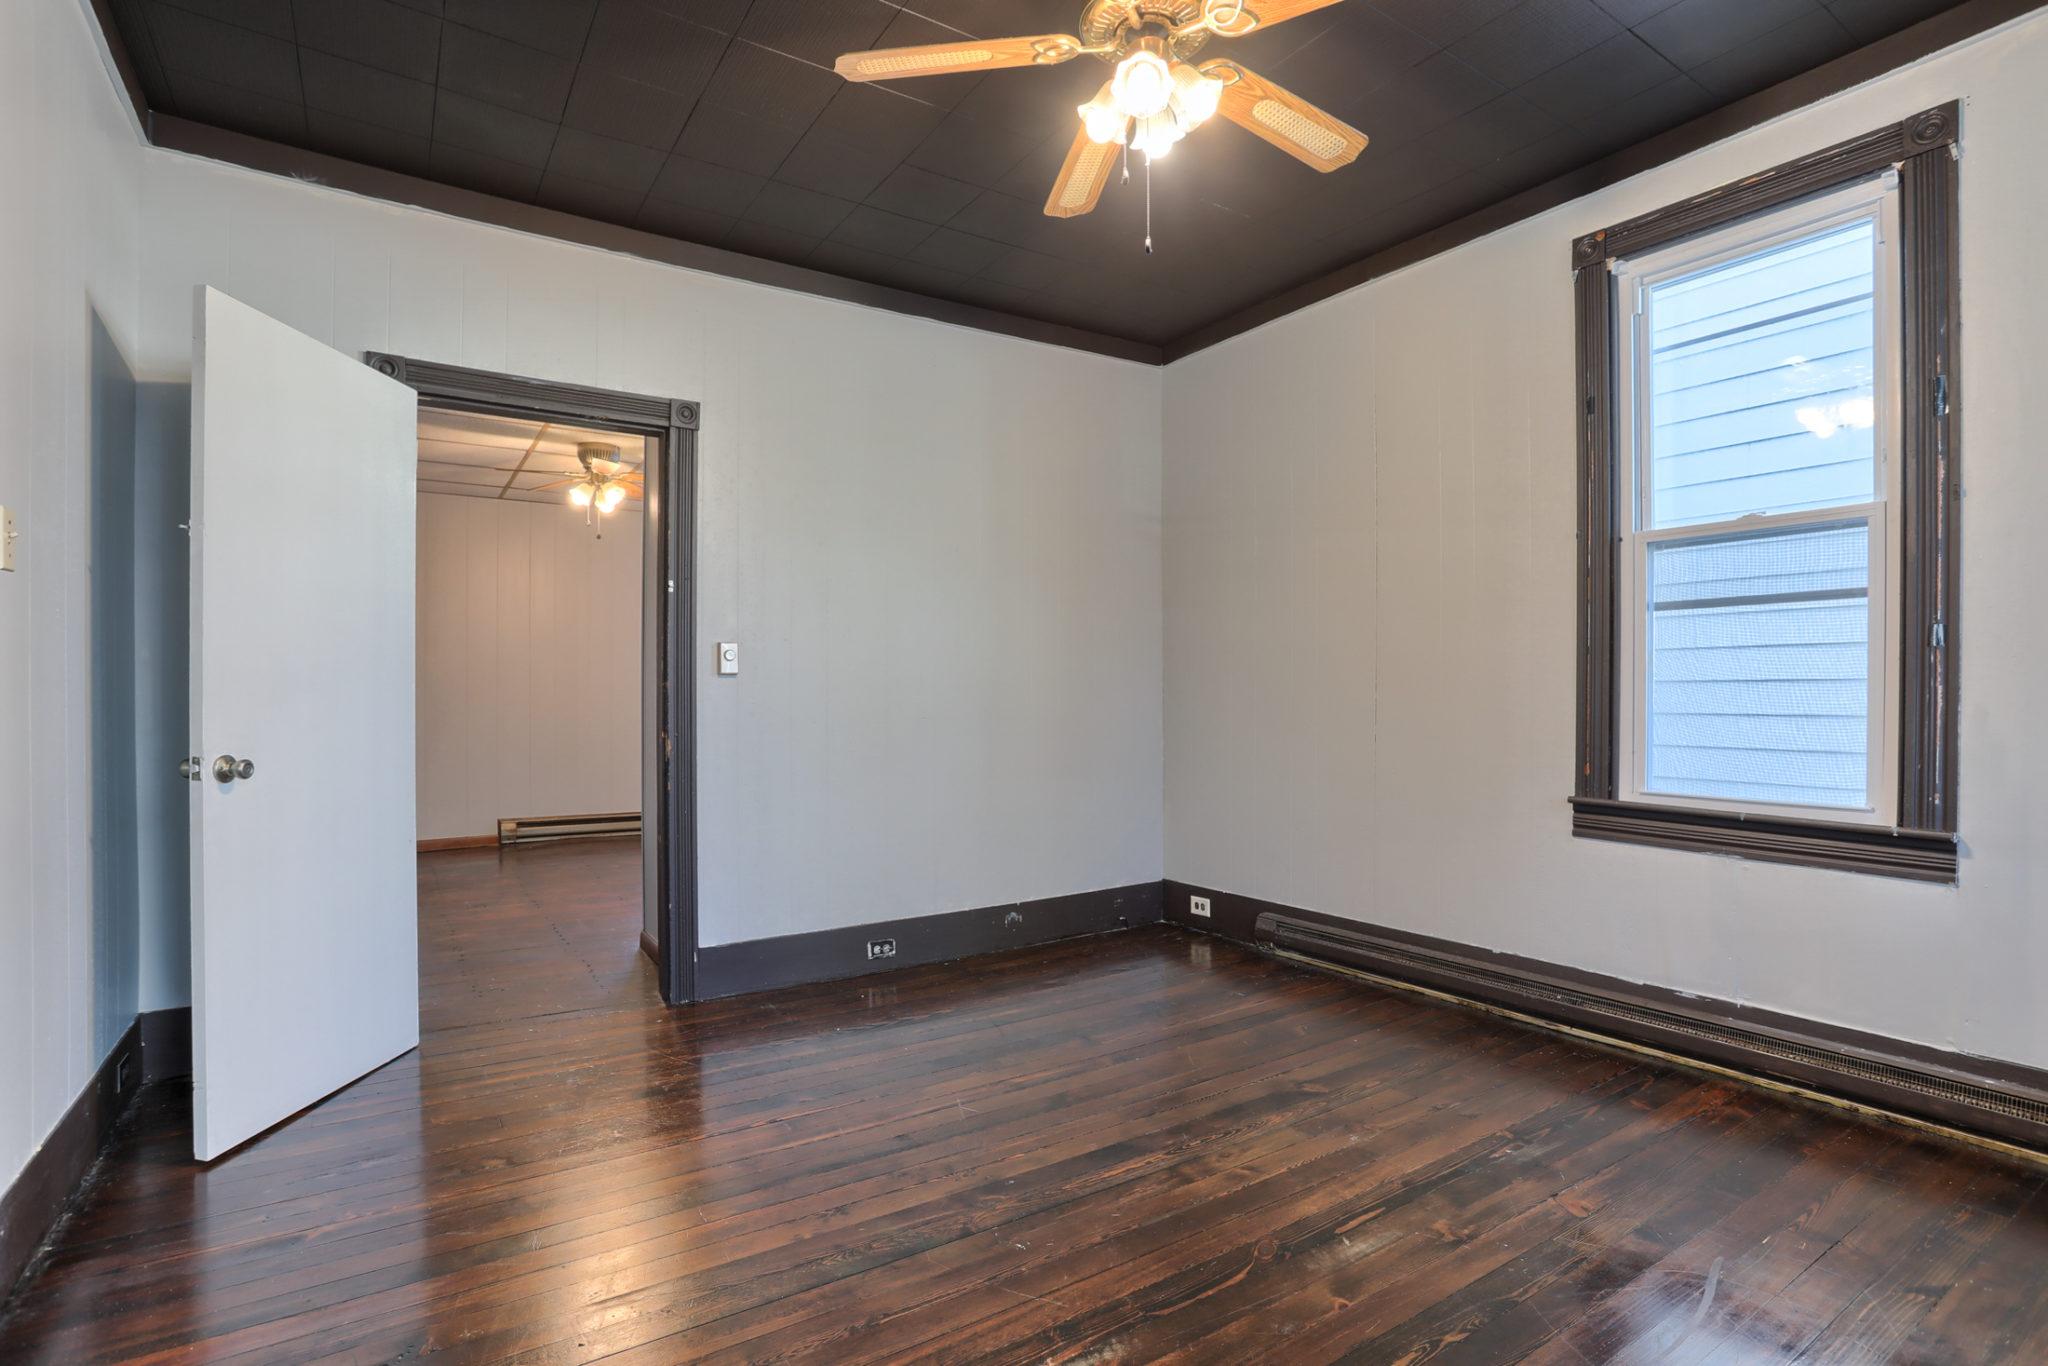 12 E. Maple Avenue - Living Room 2